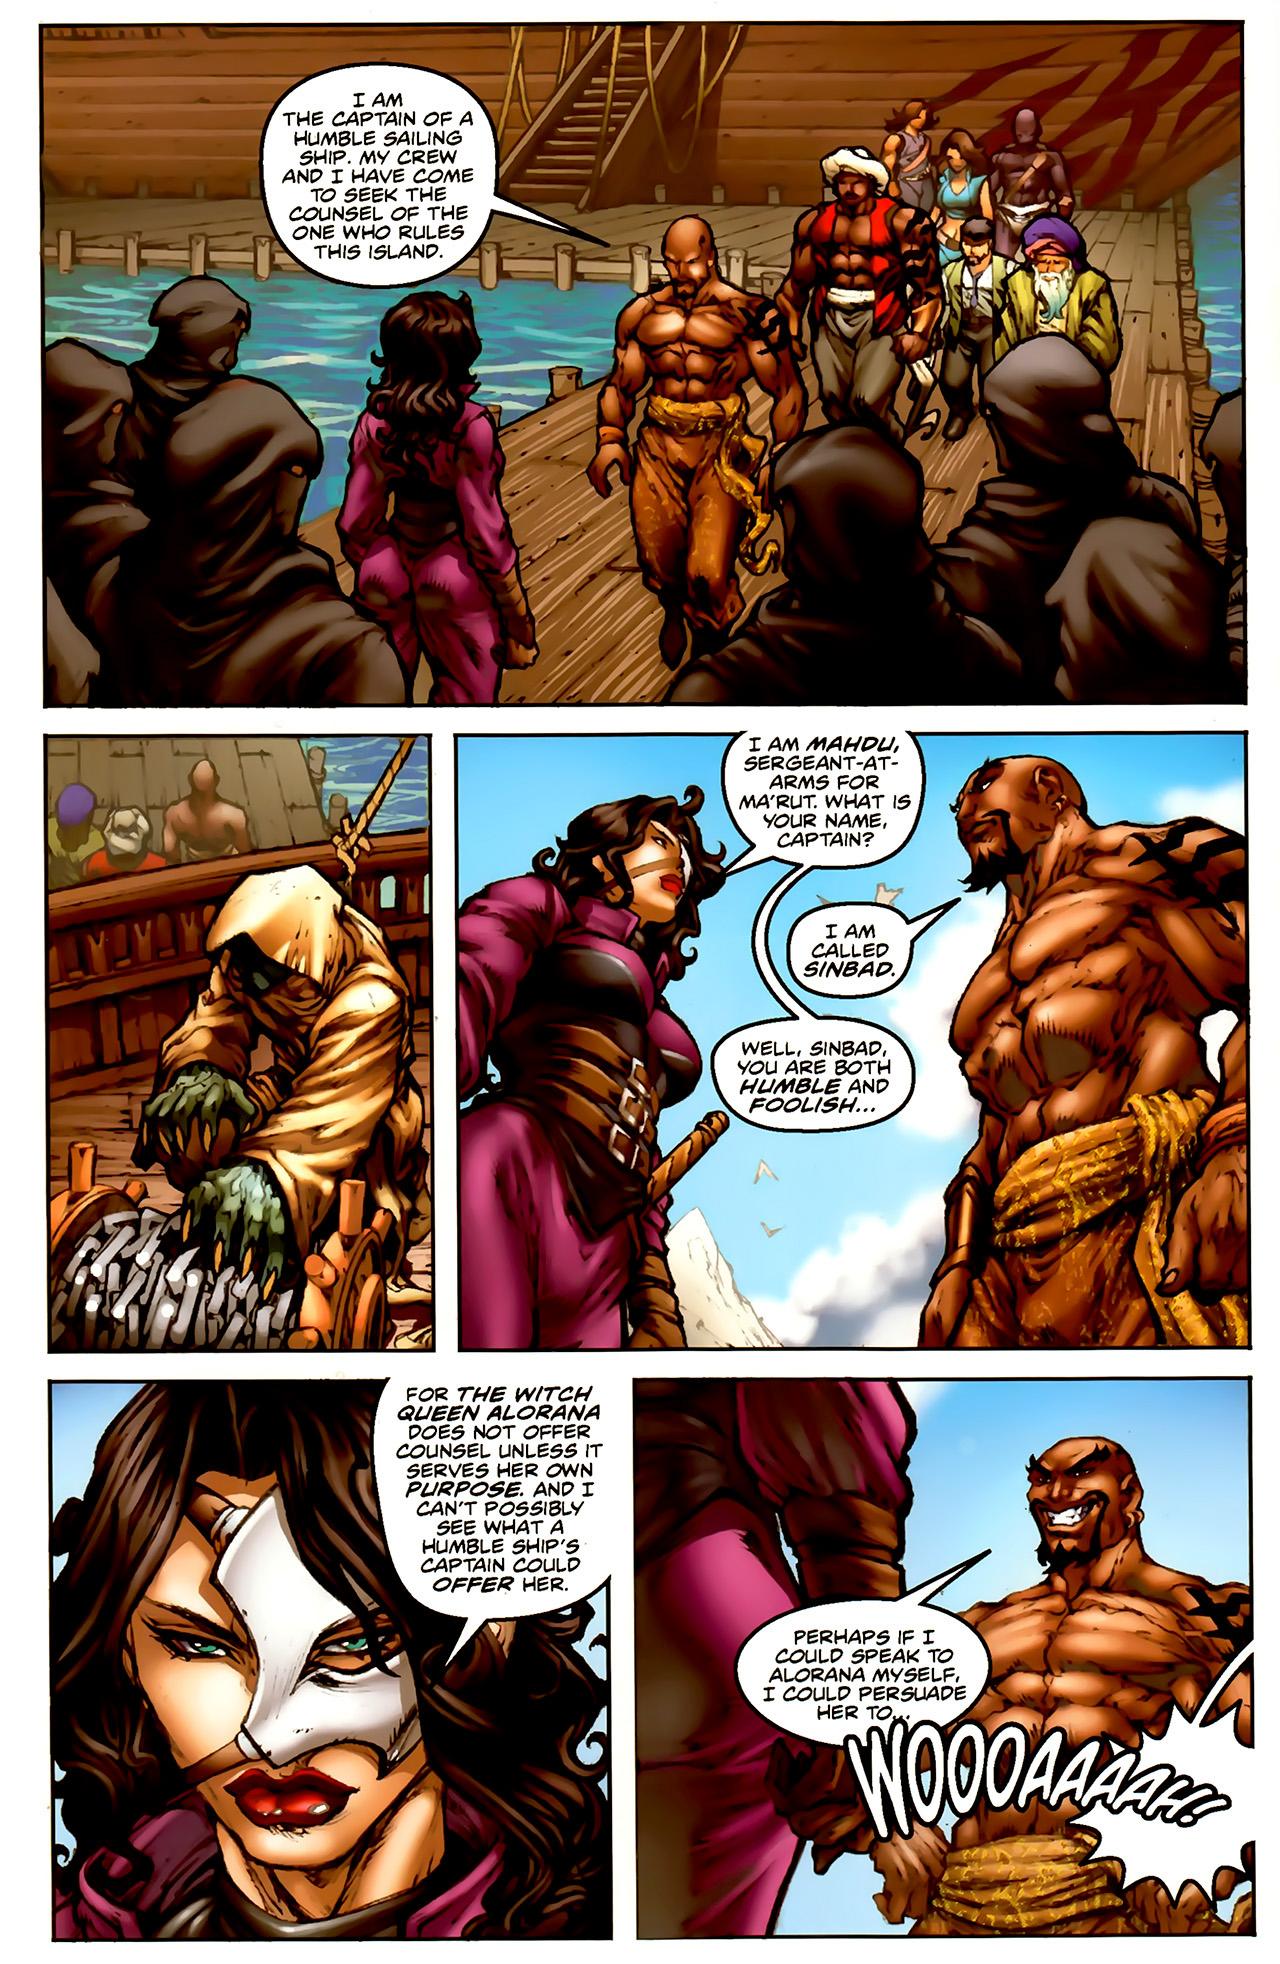 Read online 1001 Arabian Nights: The Adventures of Sinbad comic -  Issue #1 - 11